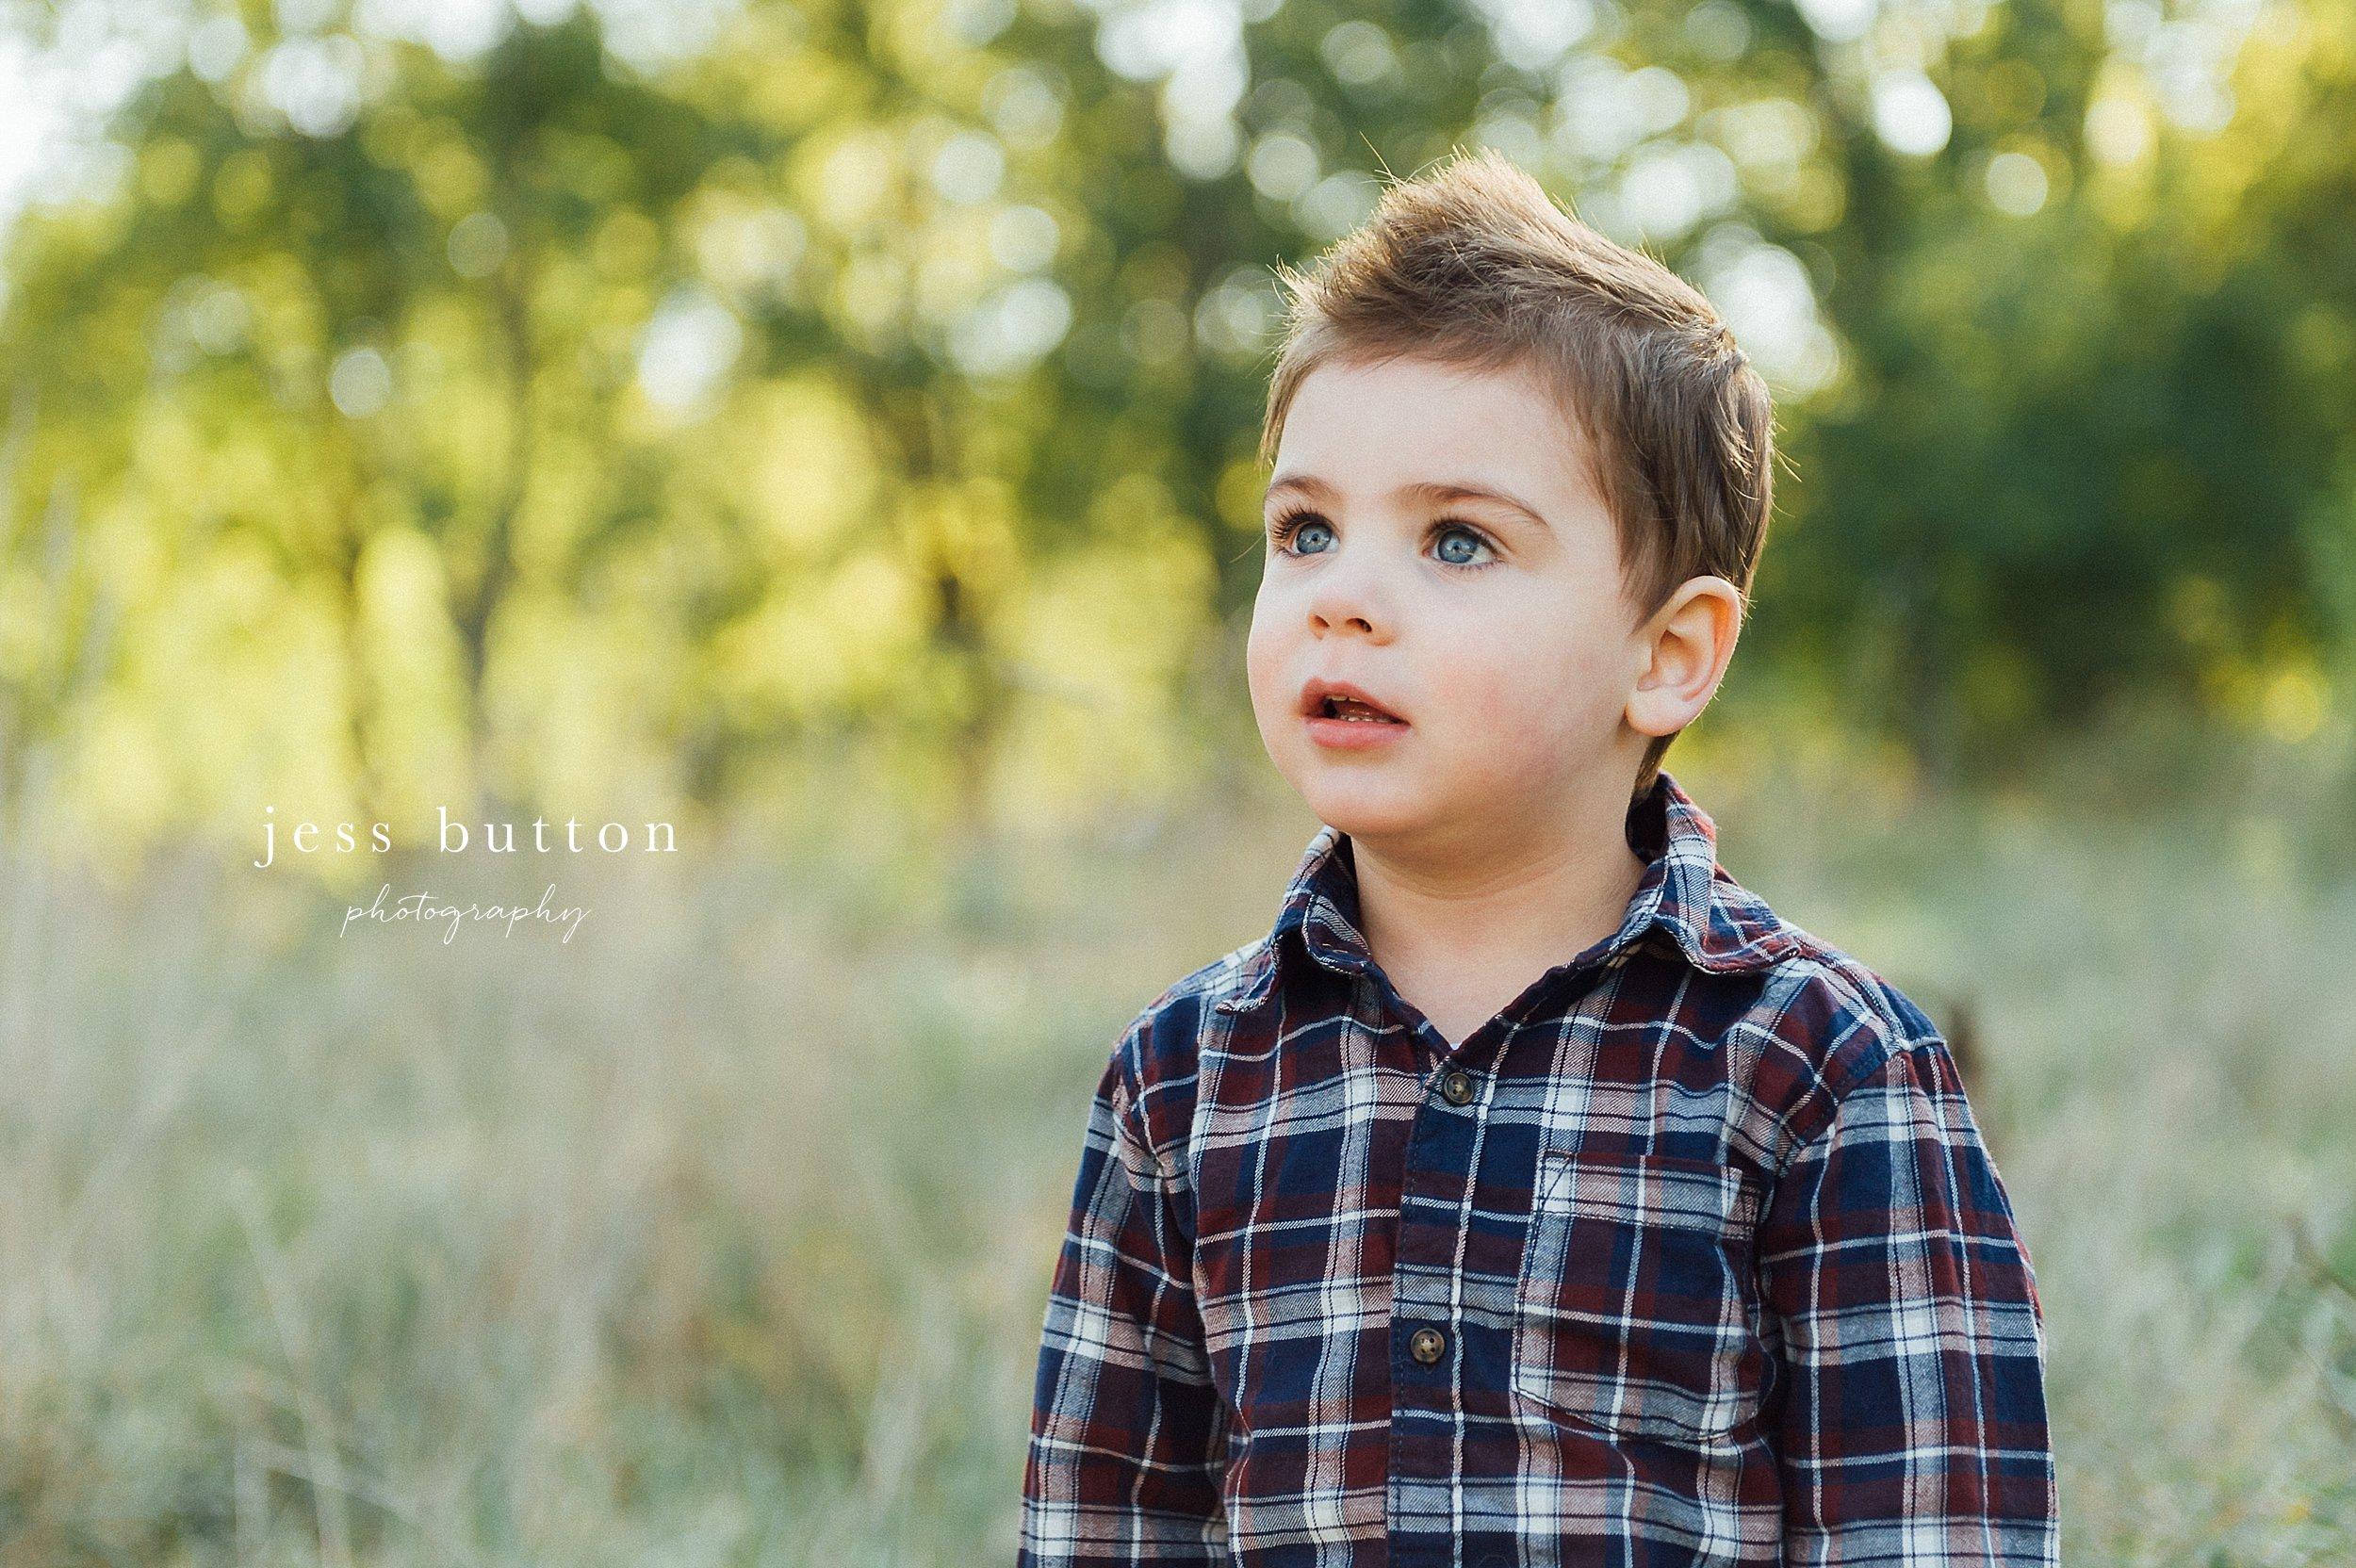 Niagara Family Photographer - Fall family portraits Niagara-on-the-Lake - two year old boy candid photo